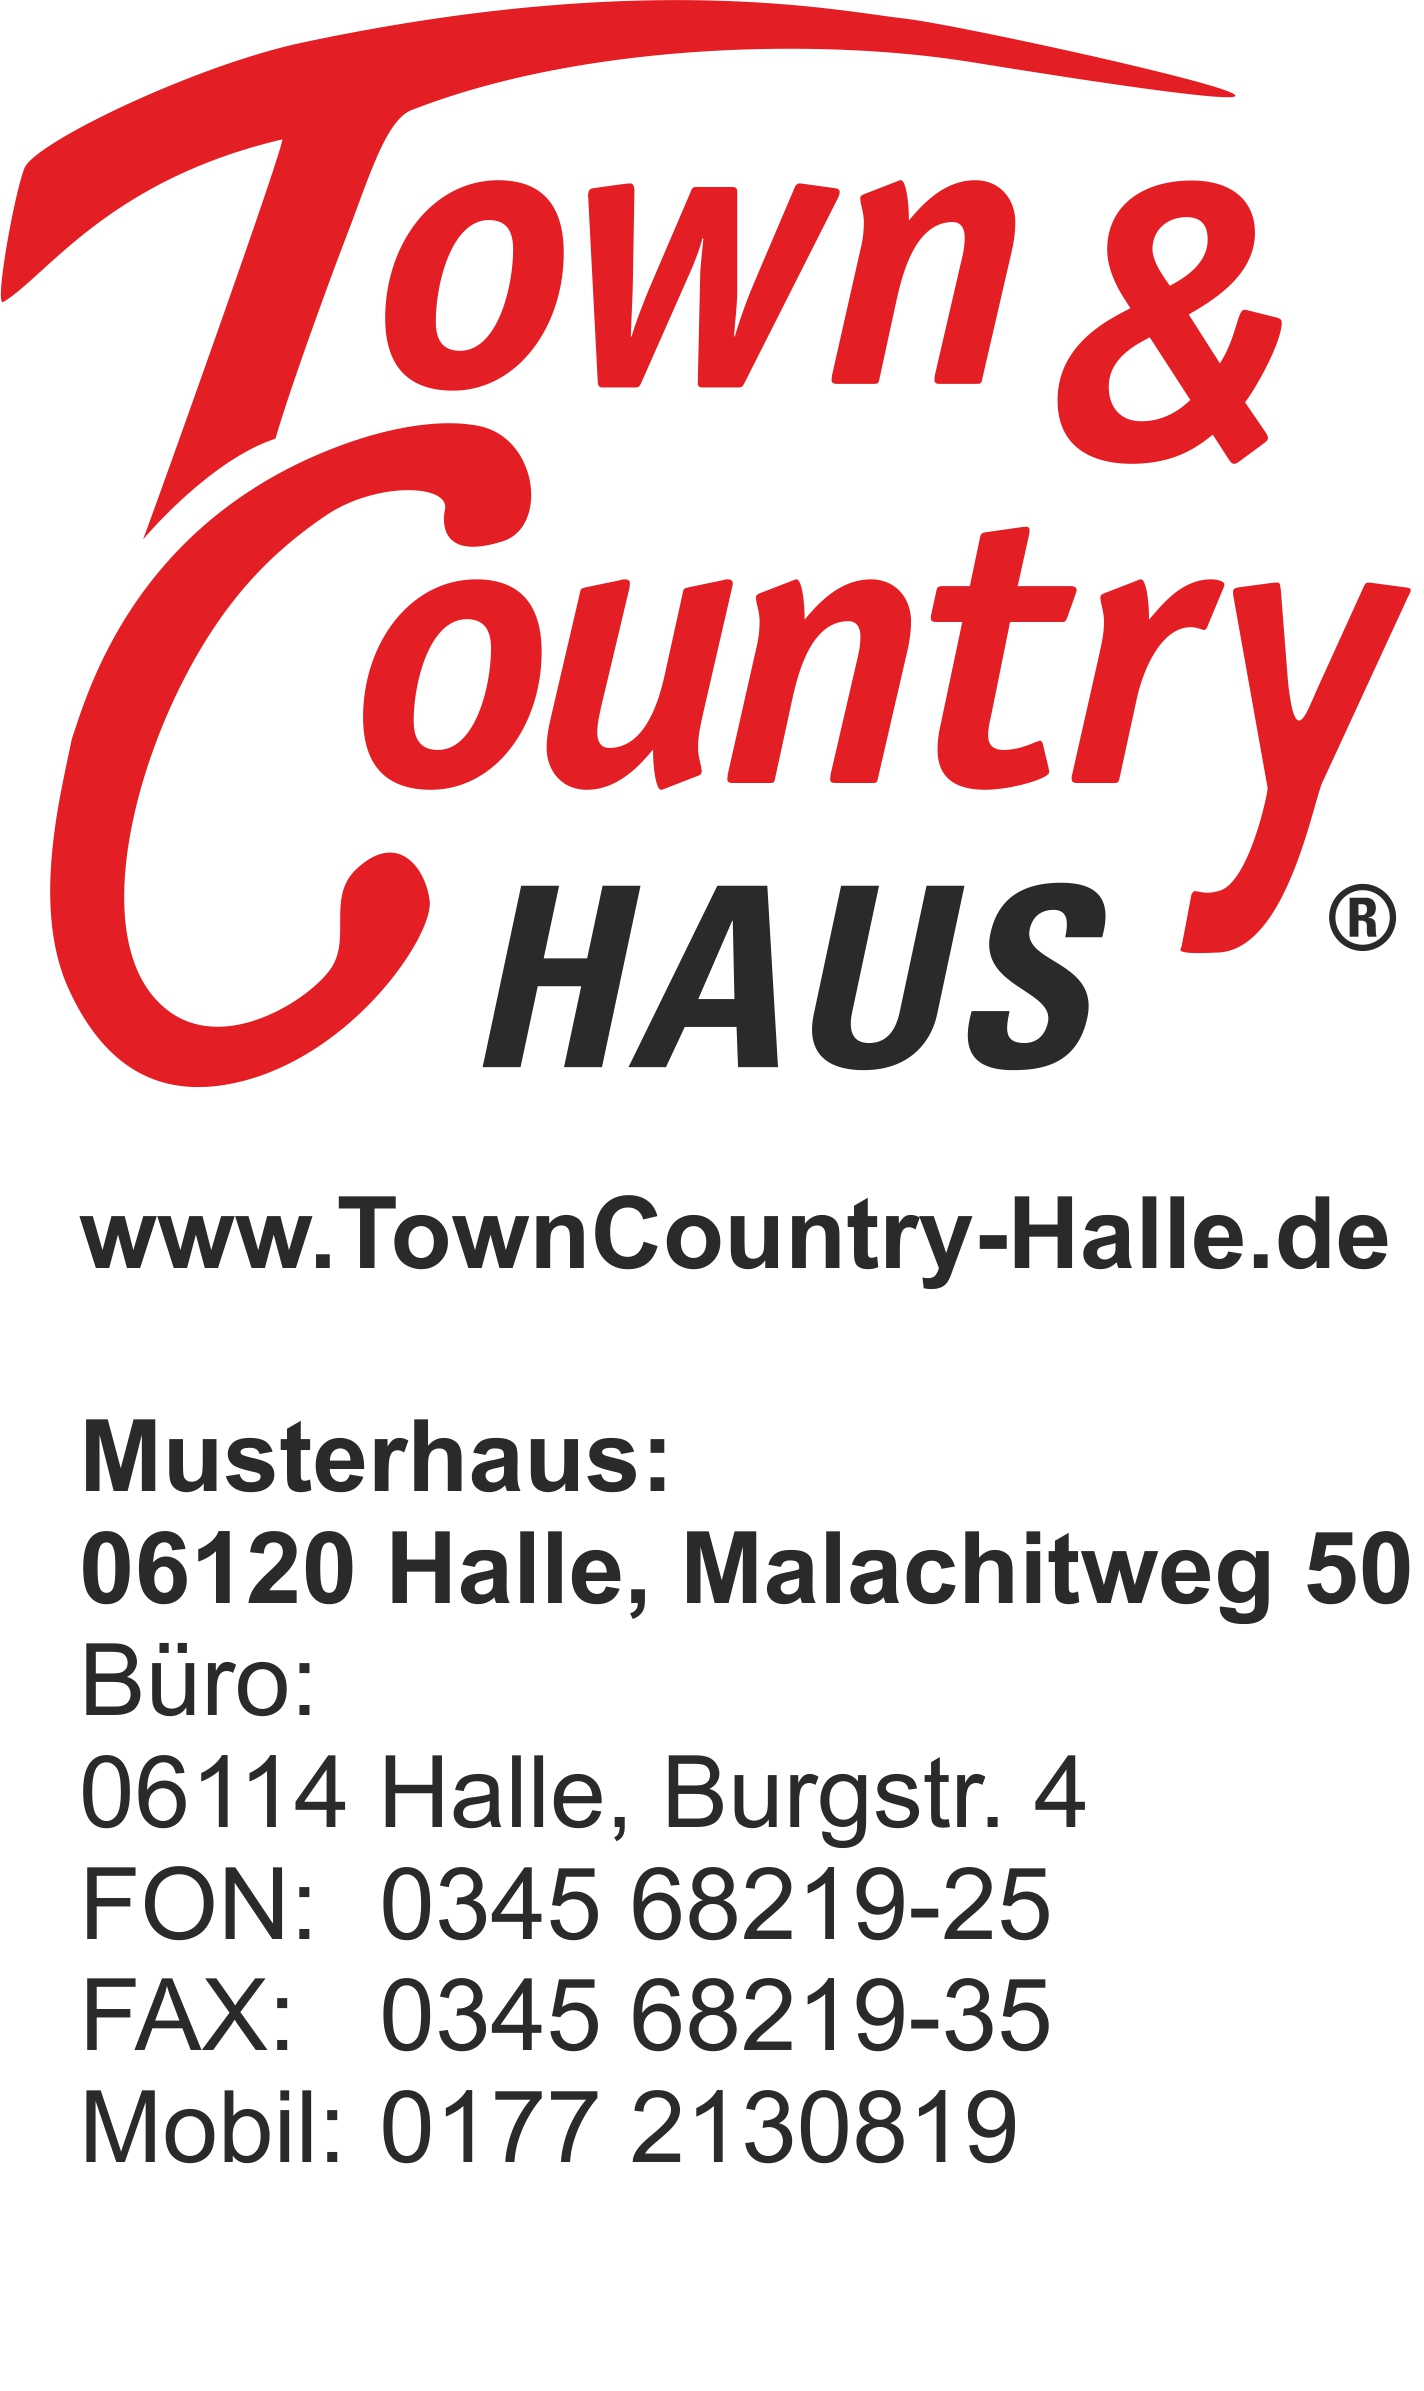 Logo Town & Country Haus mit Adressblock